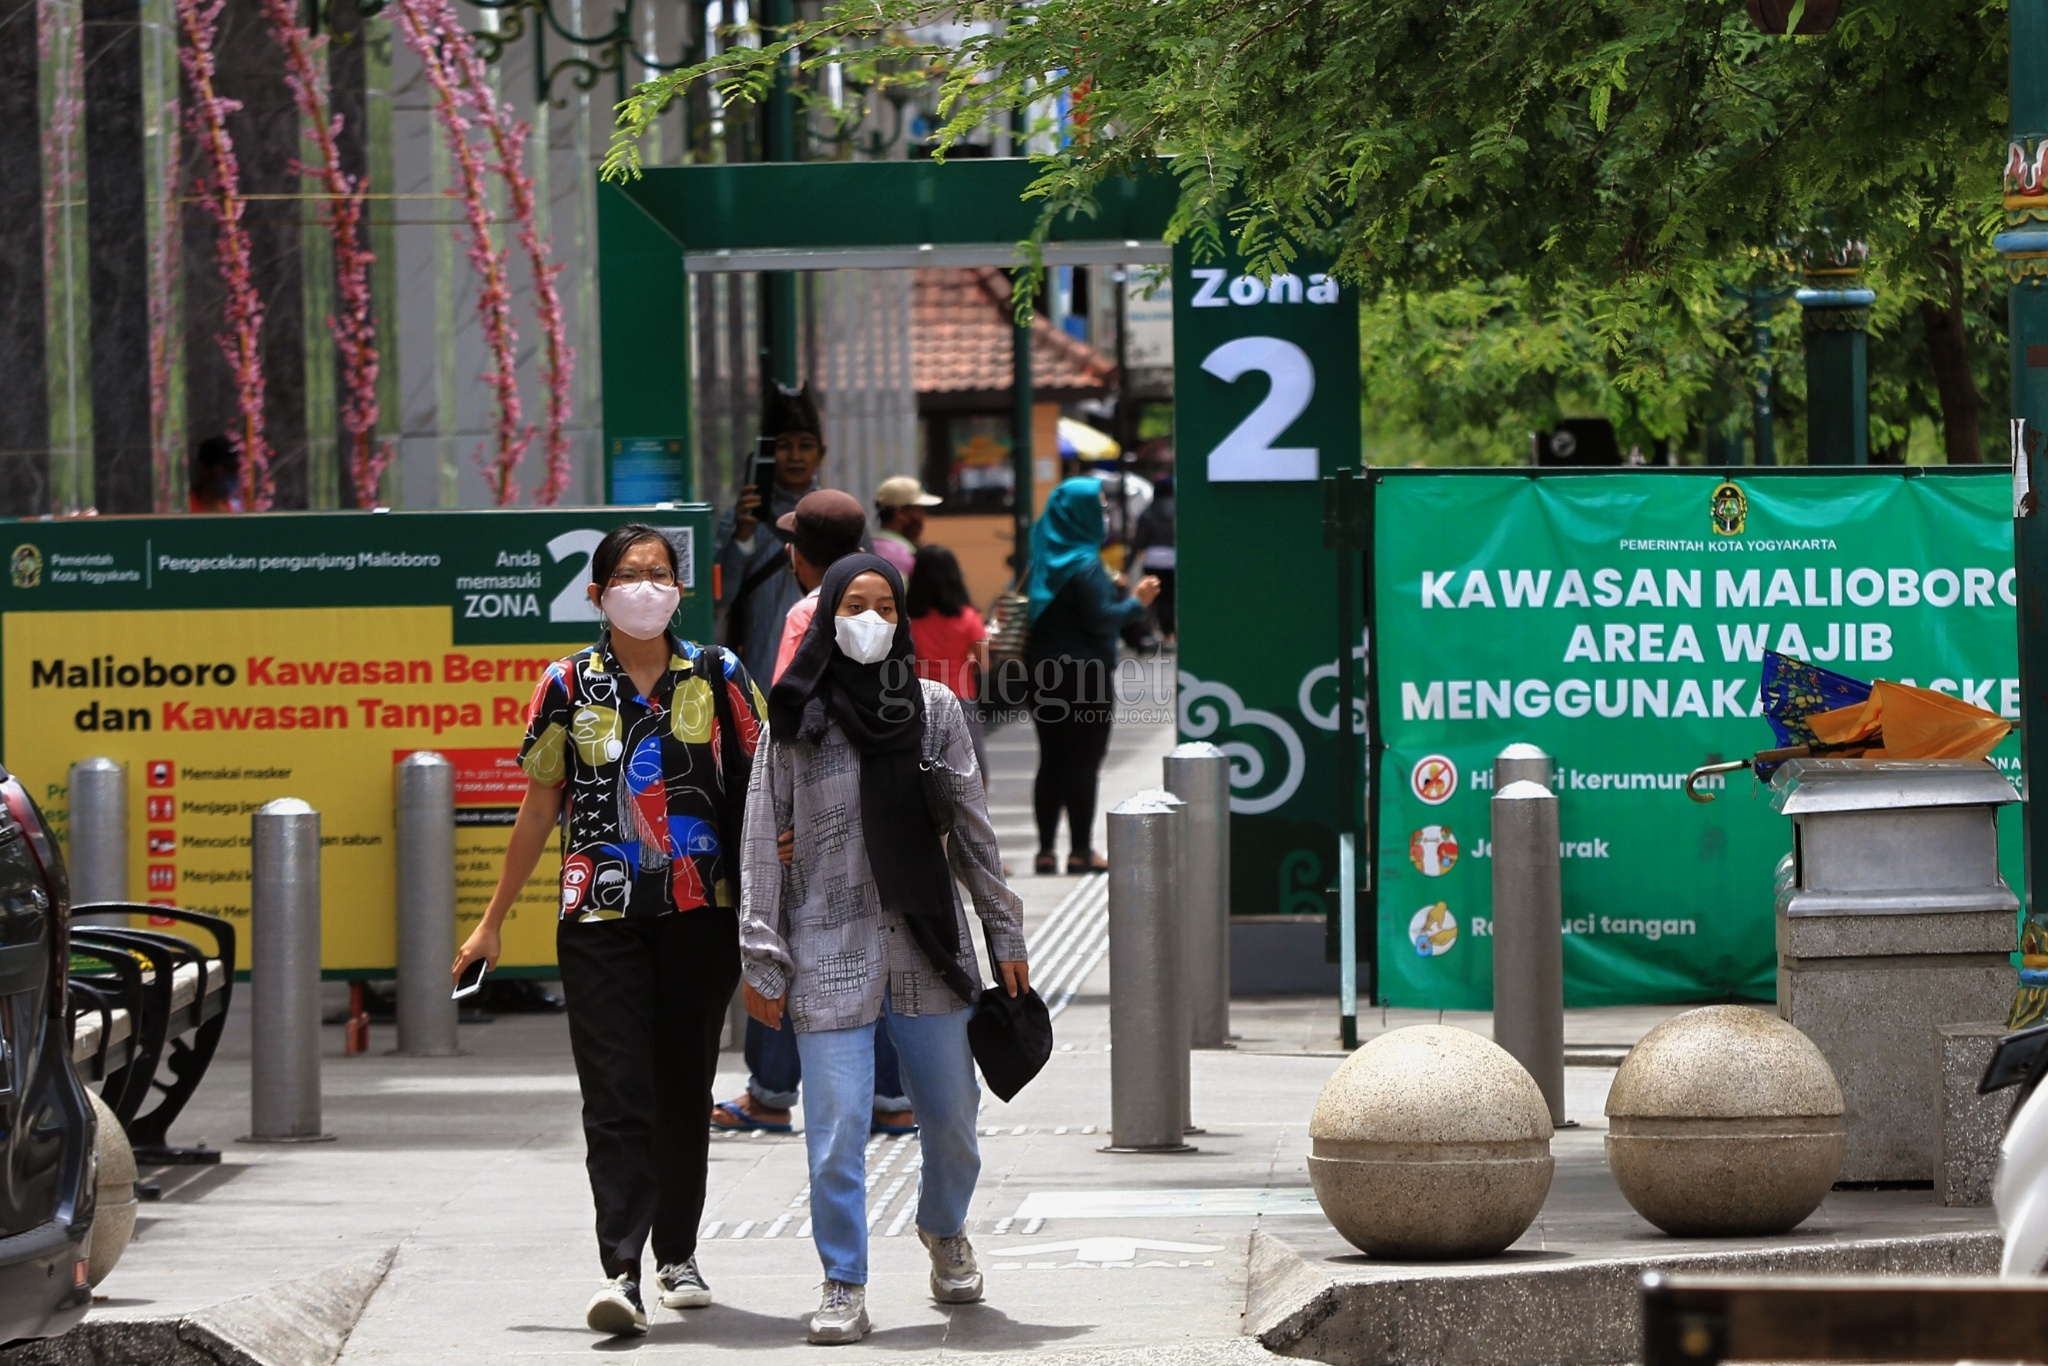 PTKM MIkro Kembali Diperpanjang Hingga 8 Maret 2021